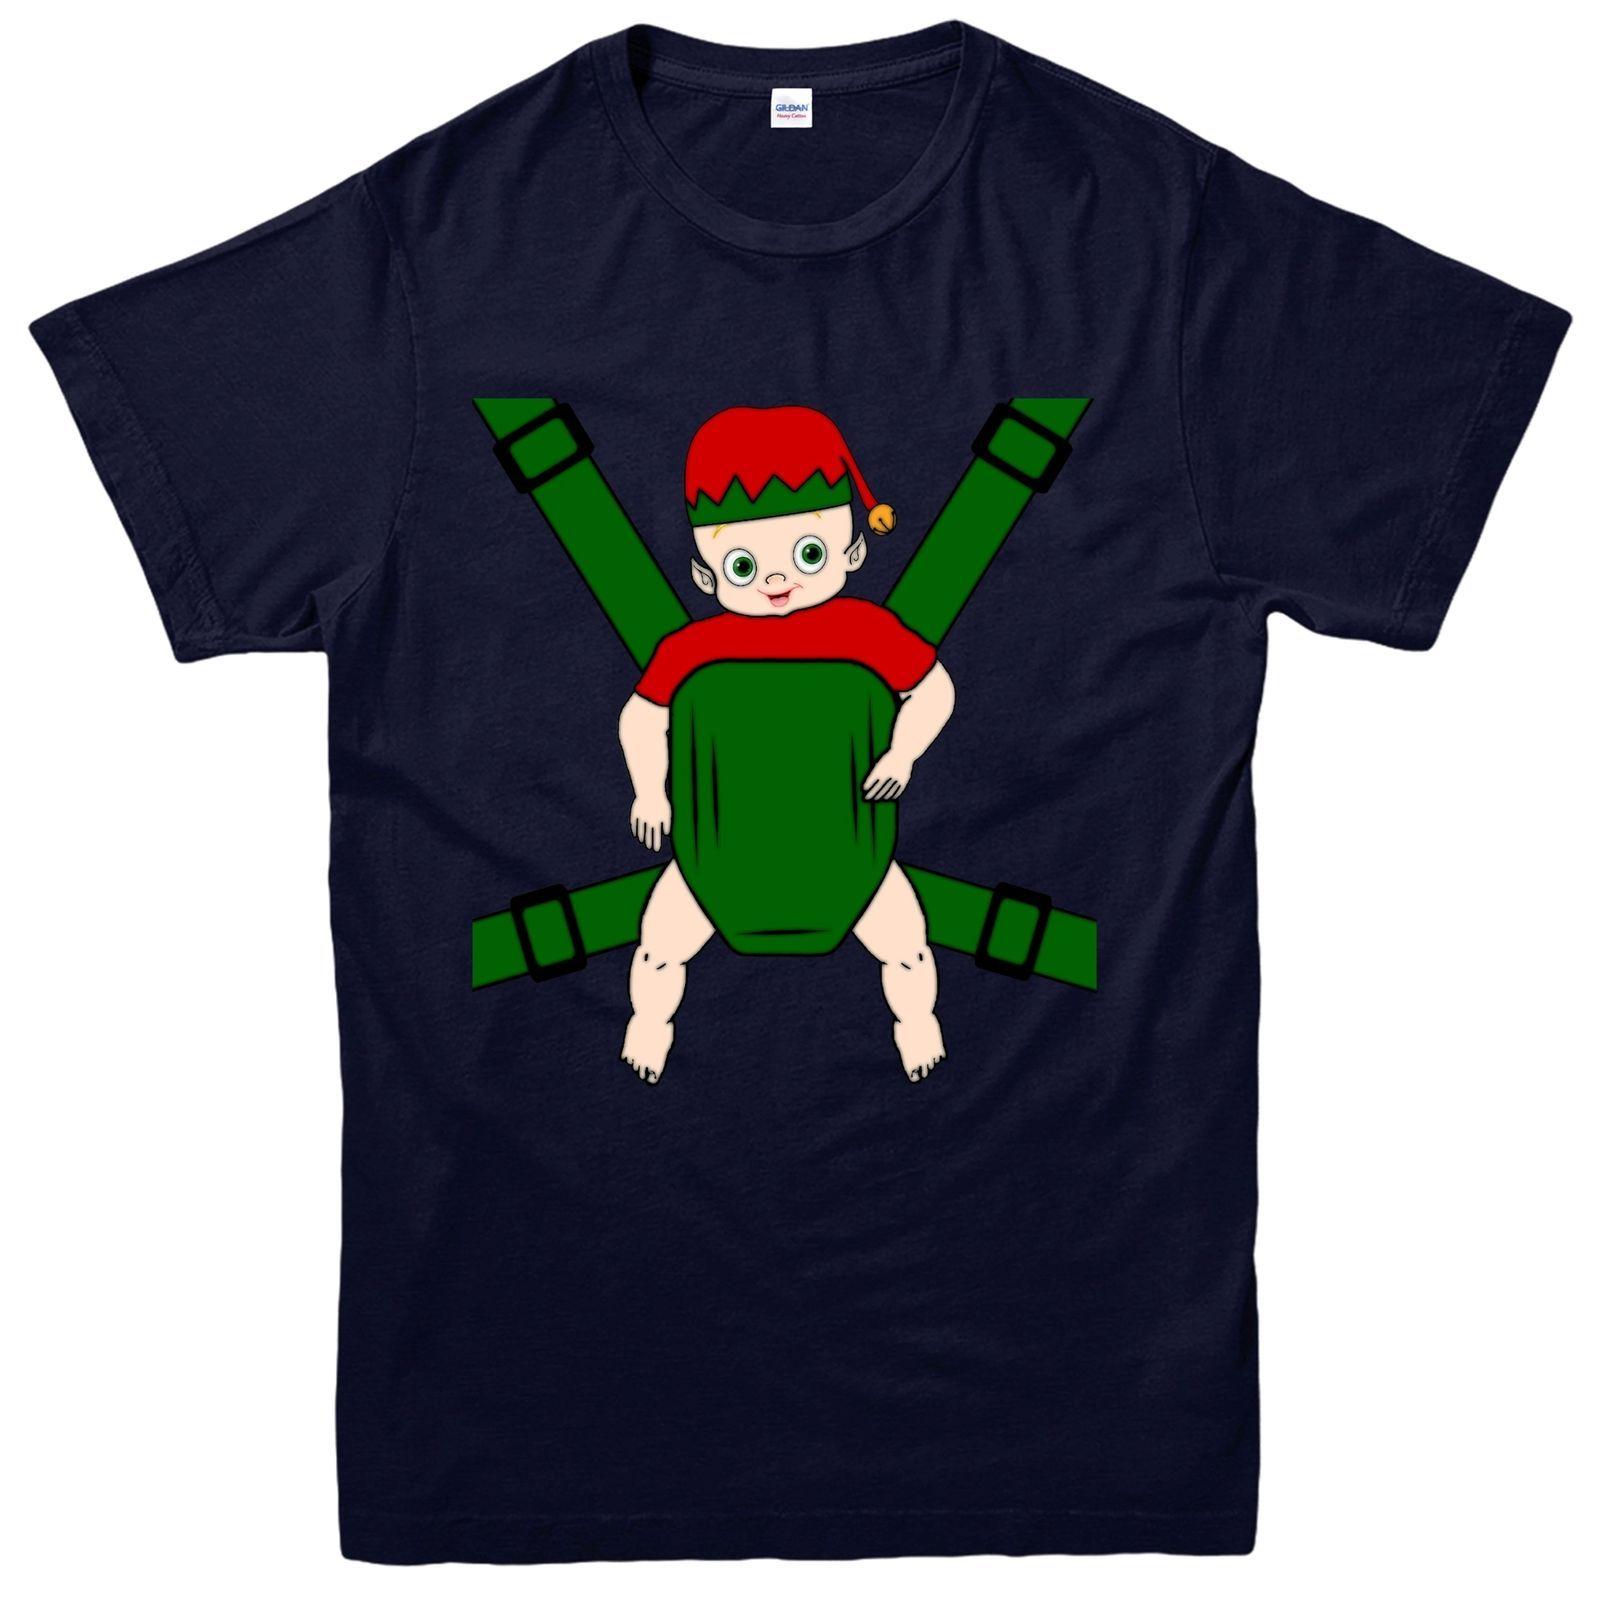 636f7013 Baby Elf Christmas Christmas T Shirt, Santa'S Elf Festive Adult & Kids Tee  Top Classic Quality High T Shirt Style Round Style Tshirt Cool T Shirts T  Shirts ...